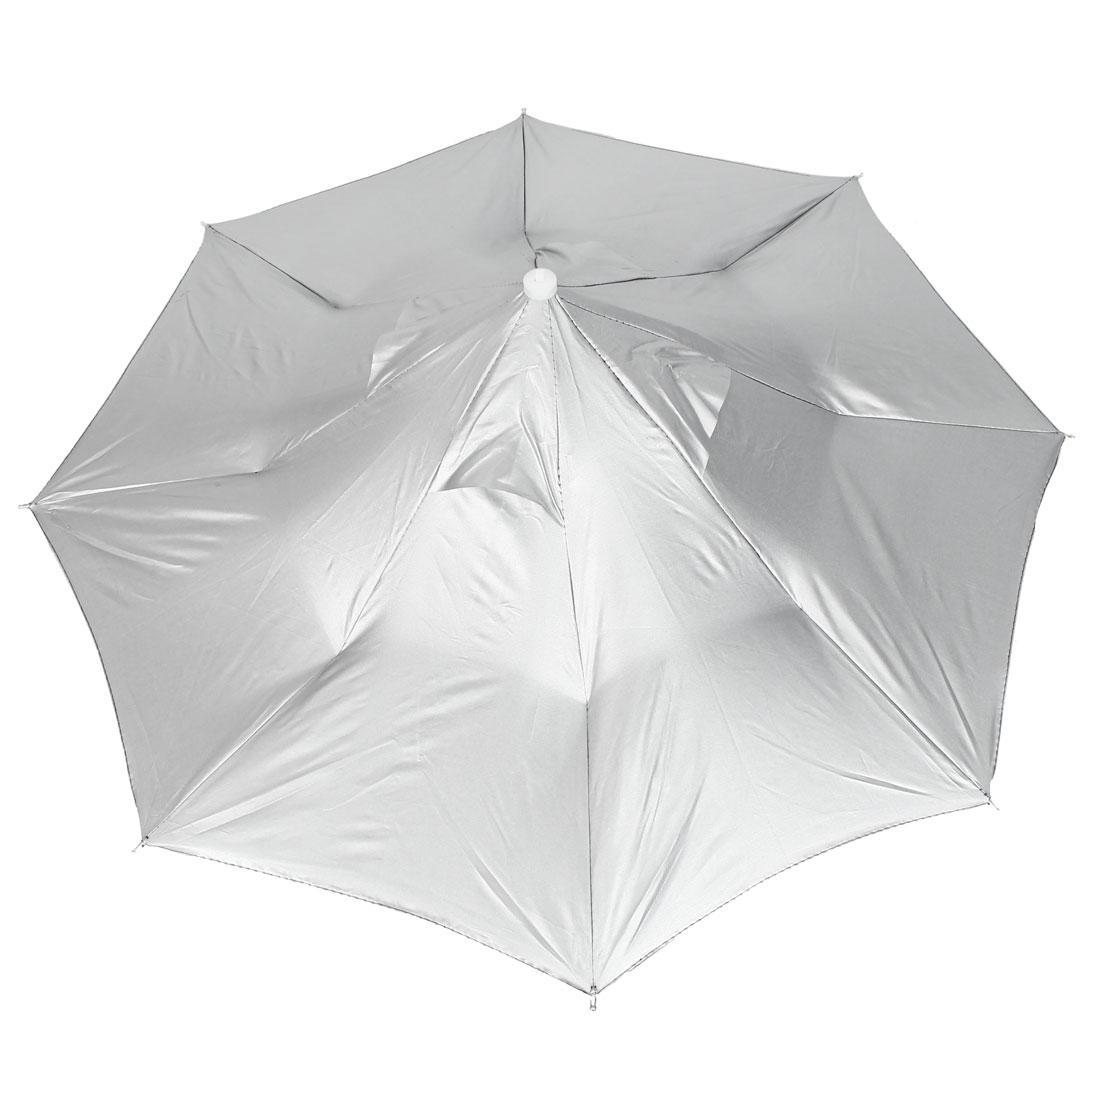 80cm Unfolded Dia Retractable Handsfree Umbrella Hat Cap Silver Tone